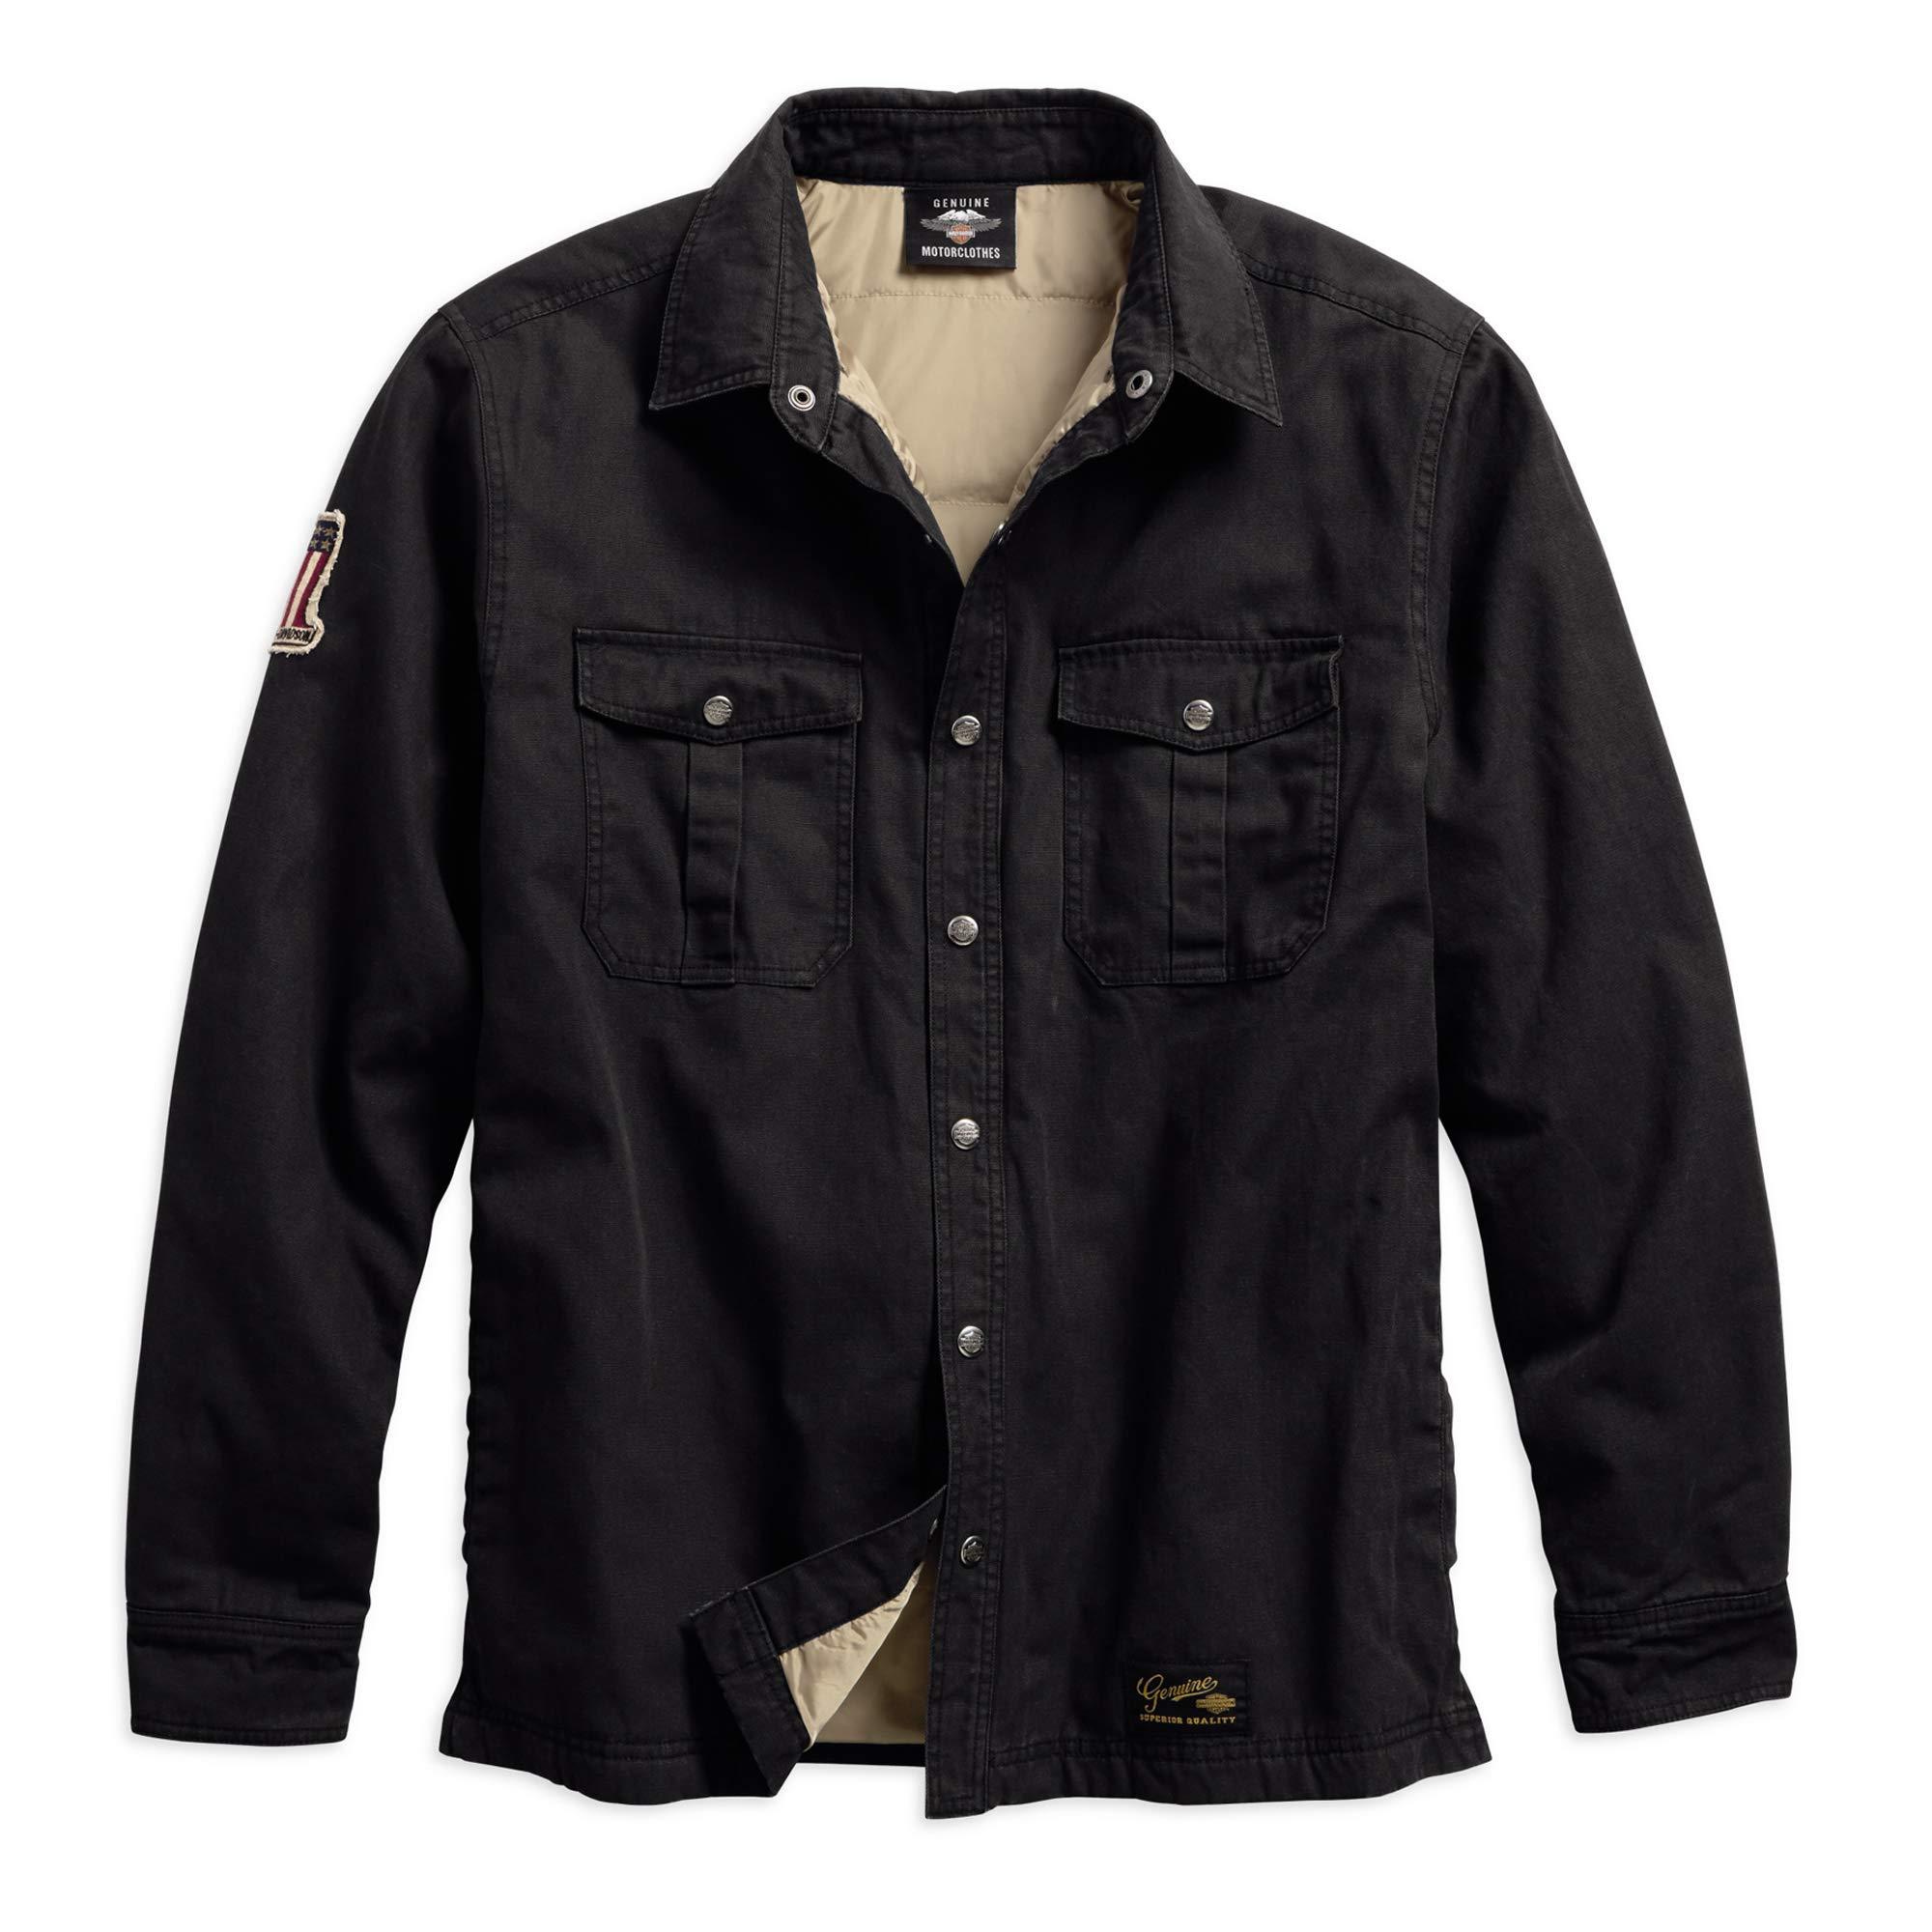 HARLEY-DAVIDSON Men's #1 Genuine Classics Shirt Jacket, Black by HARLEY-DAVIDSON